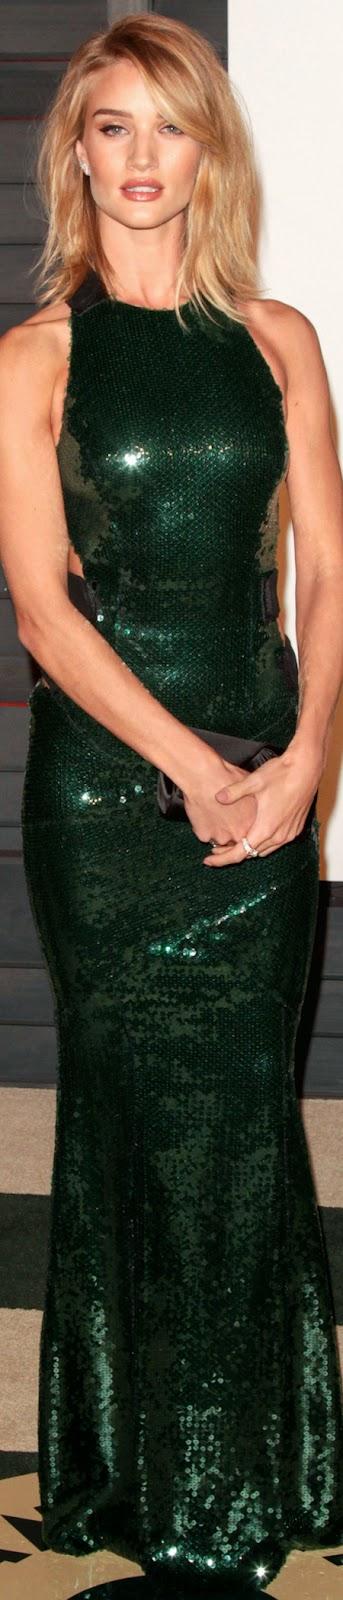 2015 Vanity Fair Oscar Party  Rosie Huntington Whiteley